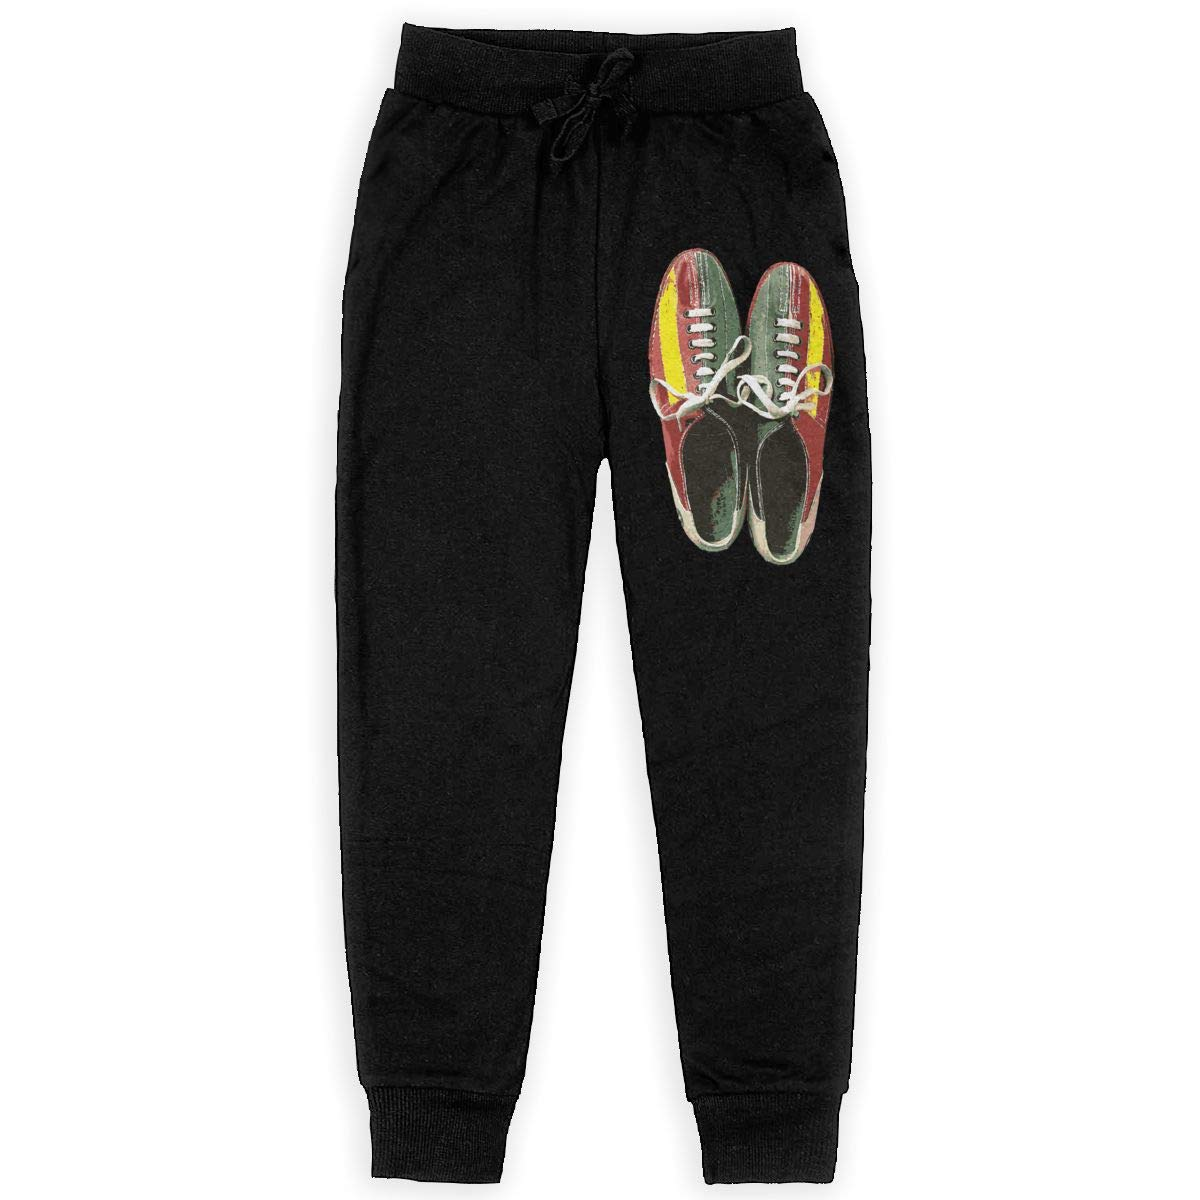 Hhyingb Bowling Shoes Girls Cool Long Pants Black